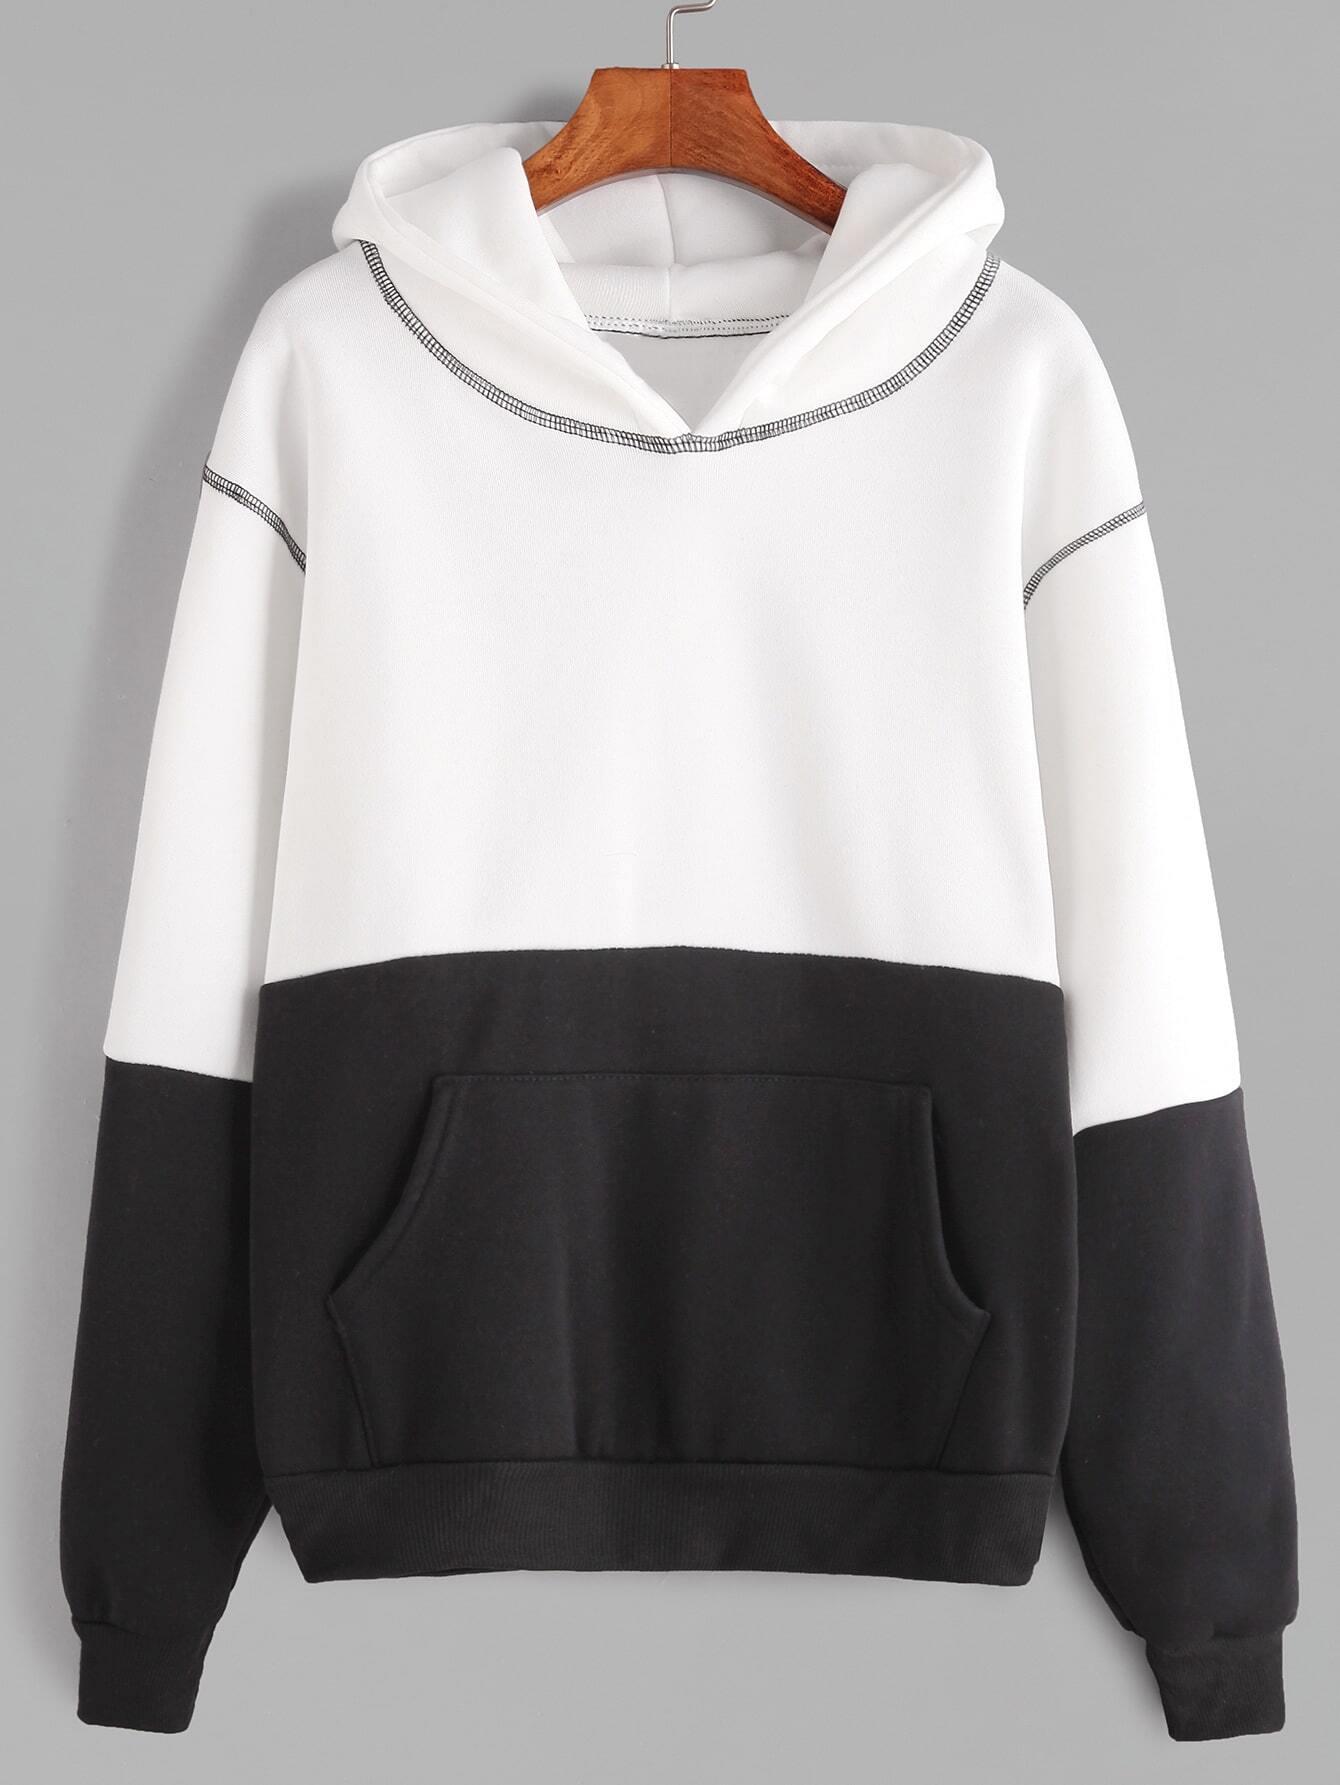 Black And White Hooded Pocket SweatshirtFor Women-romwe